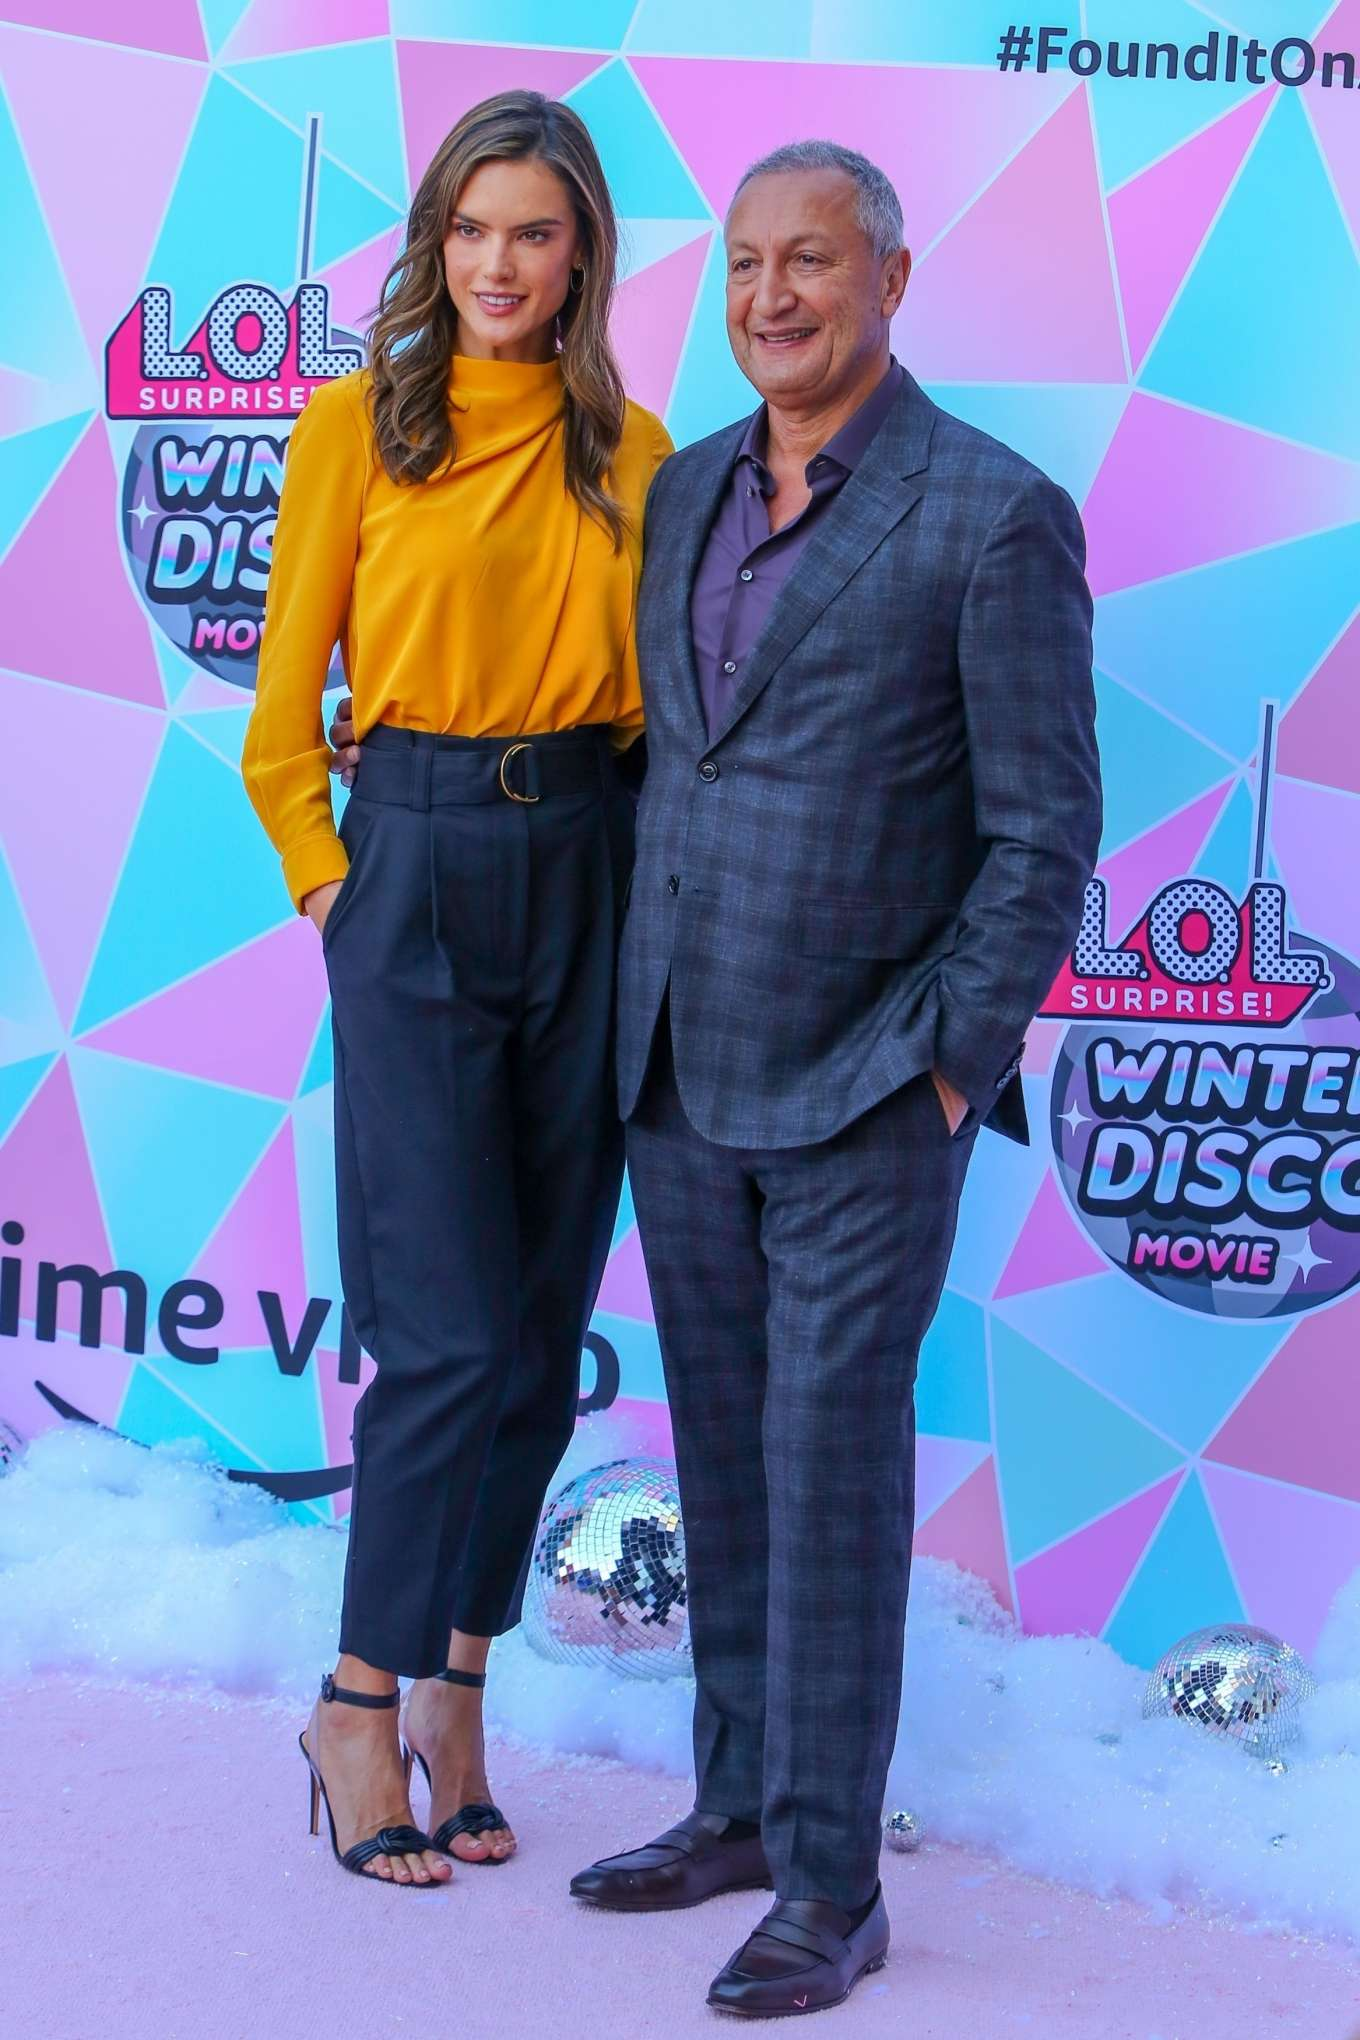 Alessandra Ambrosio 2019 : Alessandra Ambrosio – Amazons LOL Surprise Winter Disco movie-06